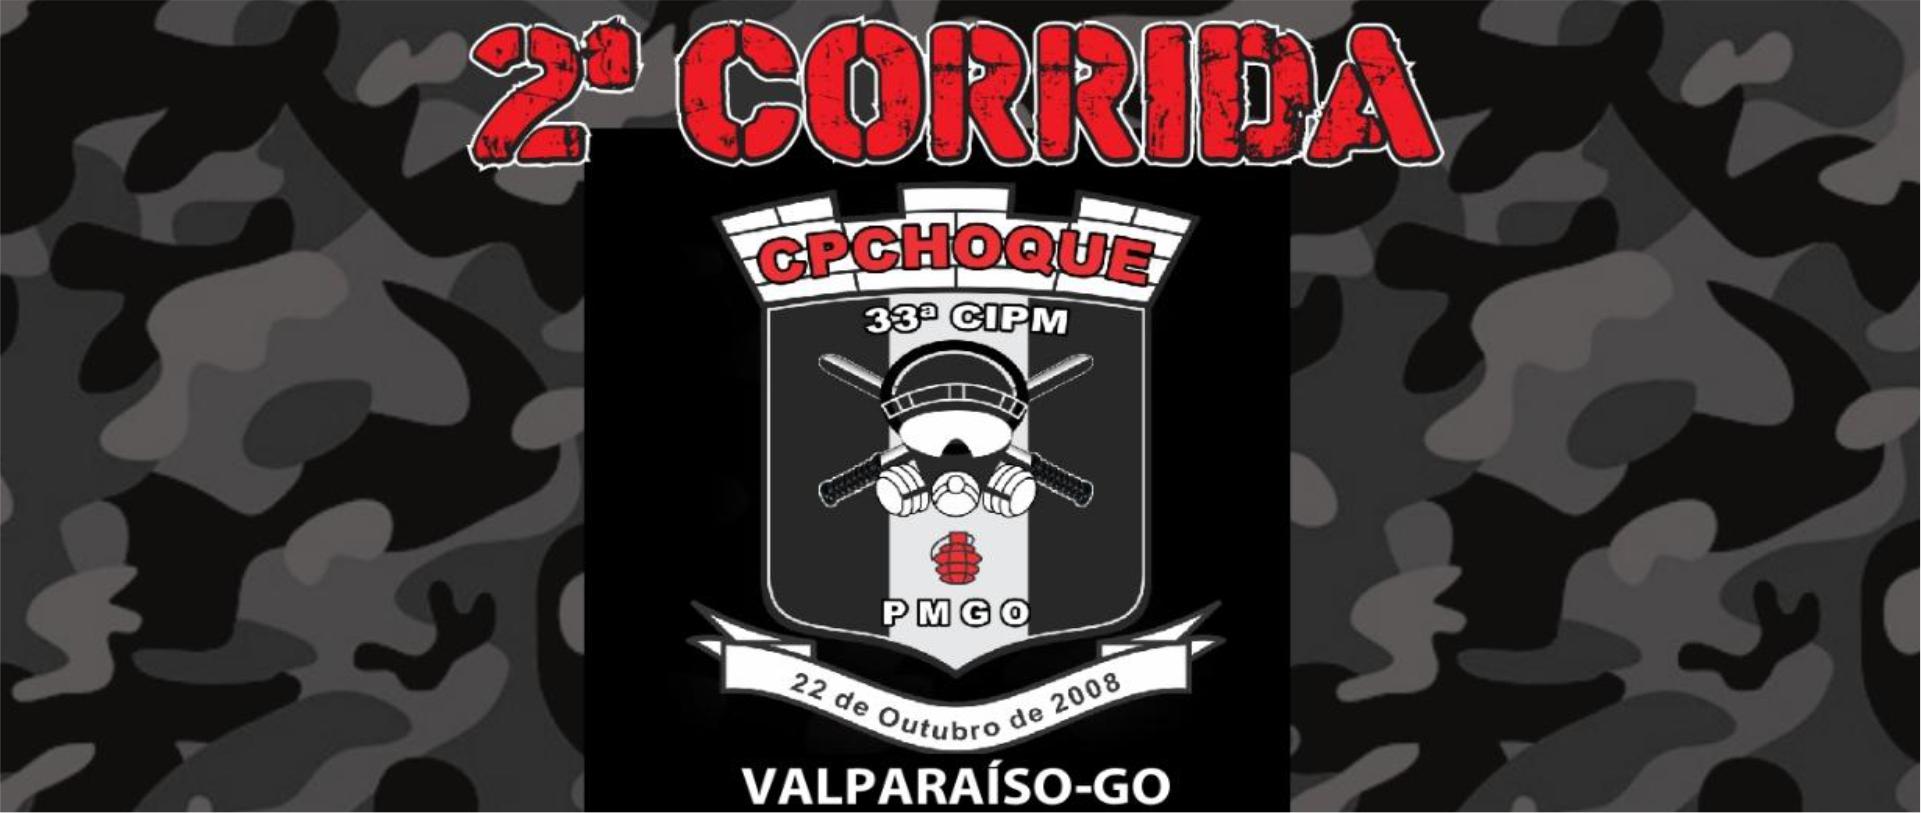 2-corrida-cpchoque-banner-s